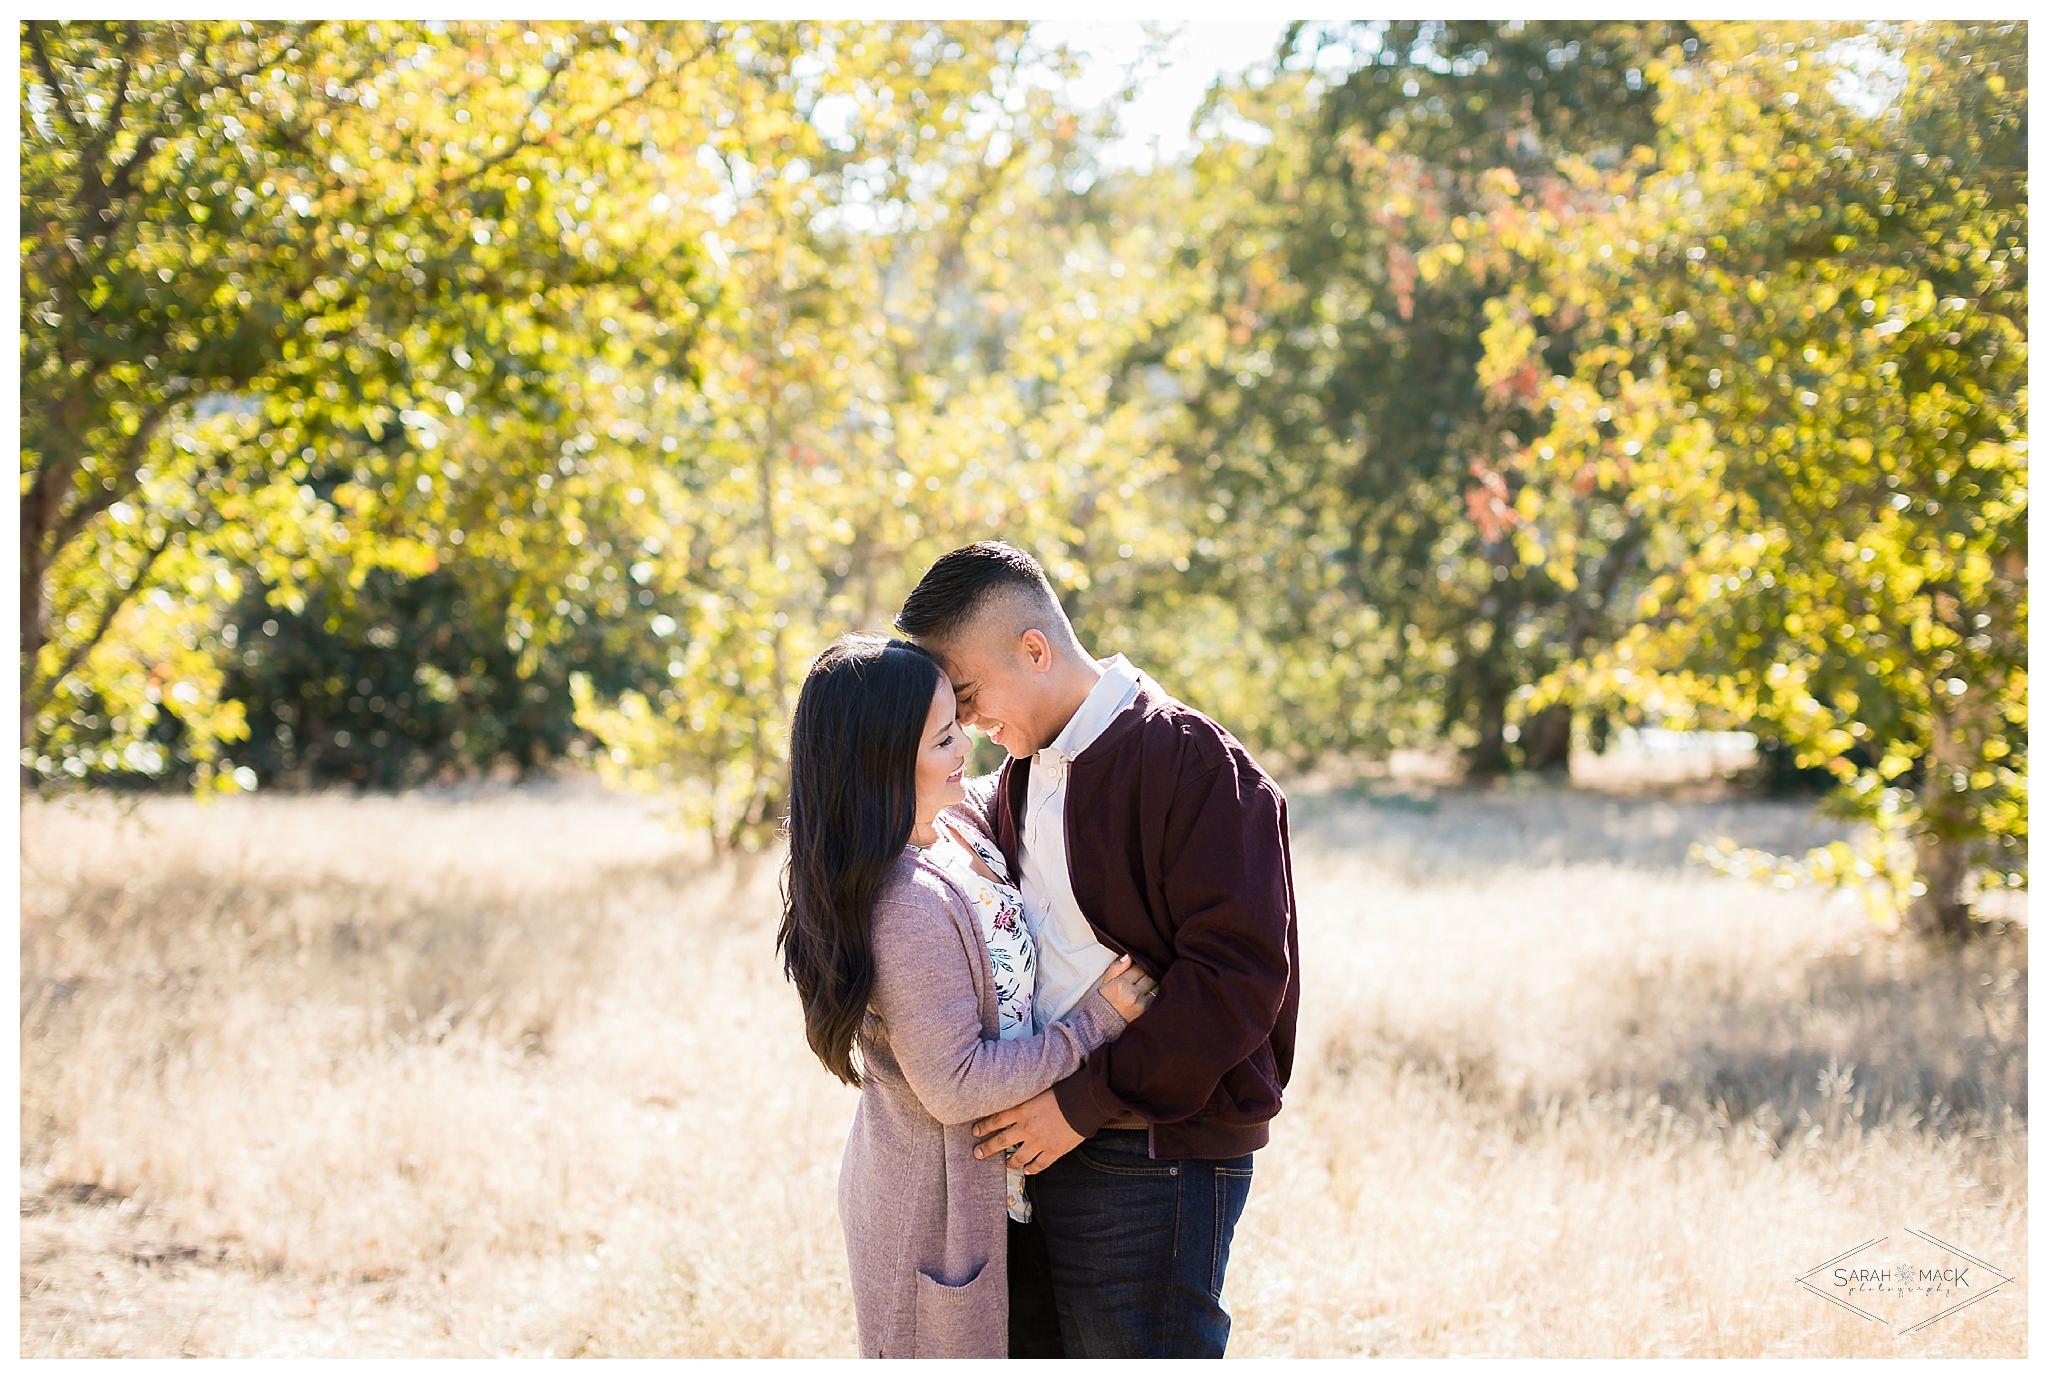 LE_Orange-County-Engagement-Photography 10.jpg